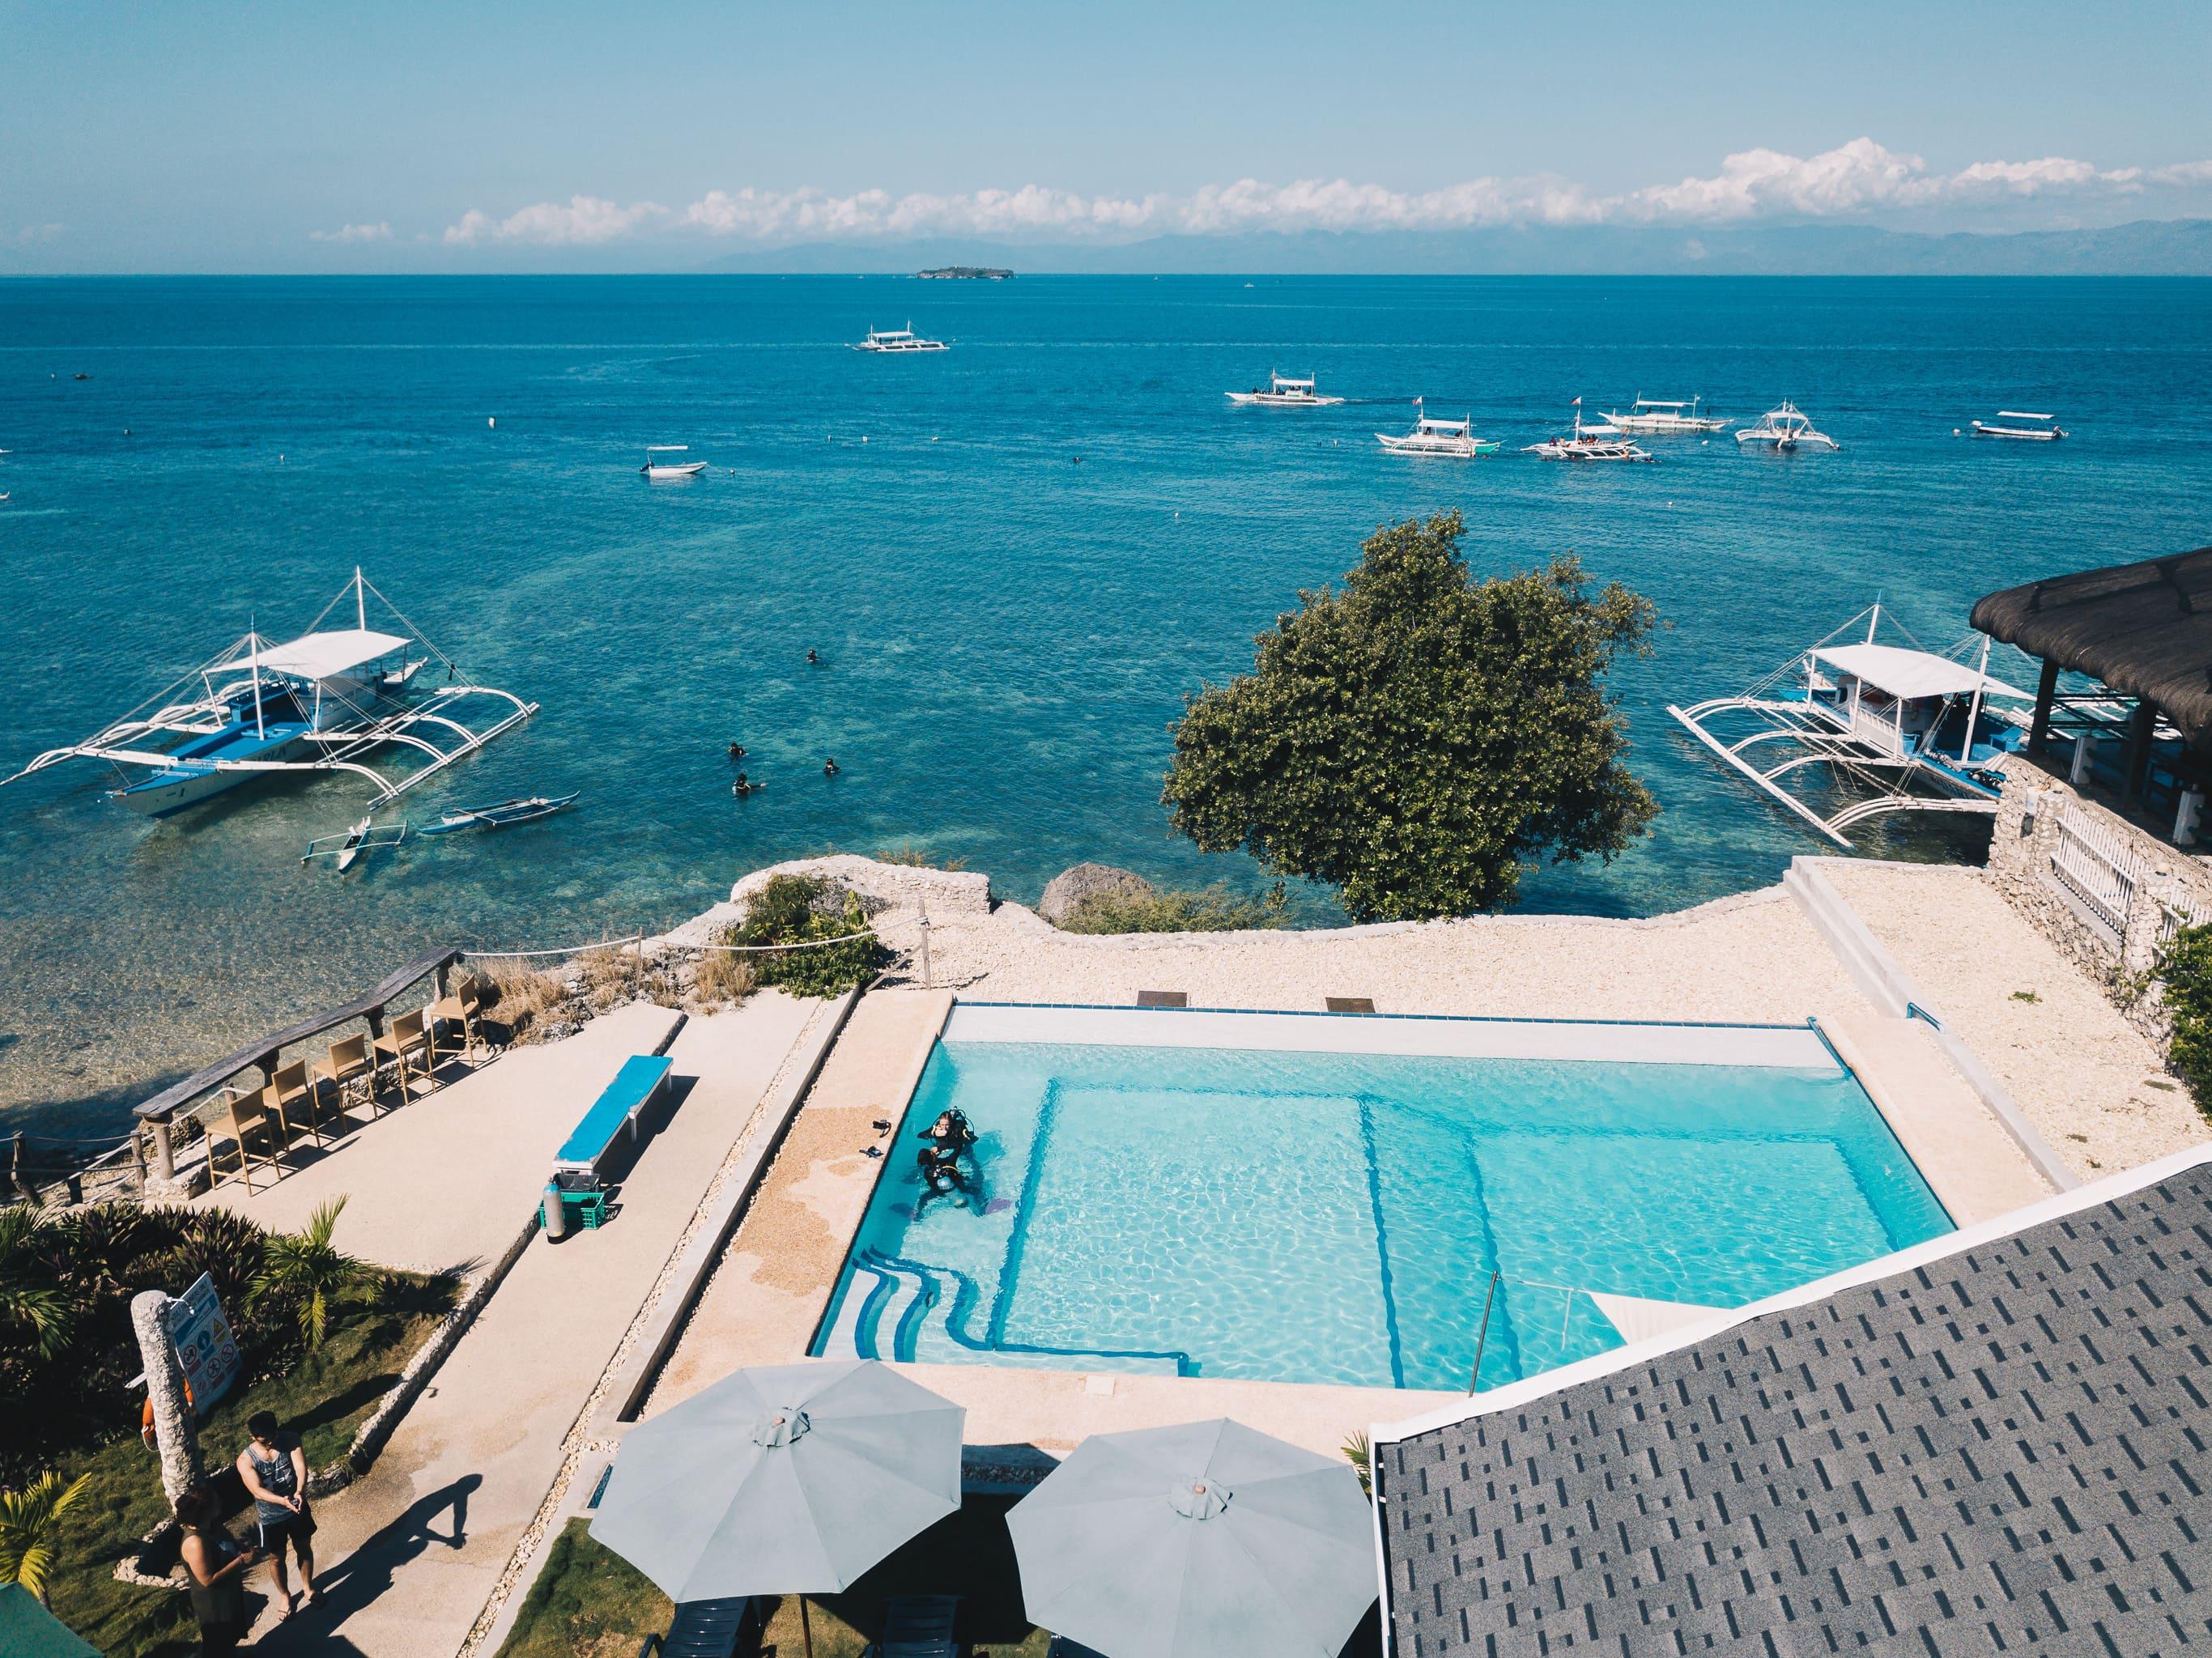 Beach view from Cebu Seaview Dive Resort